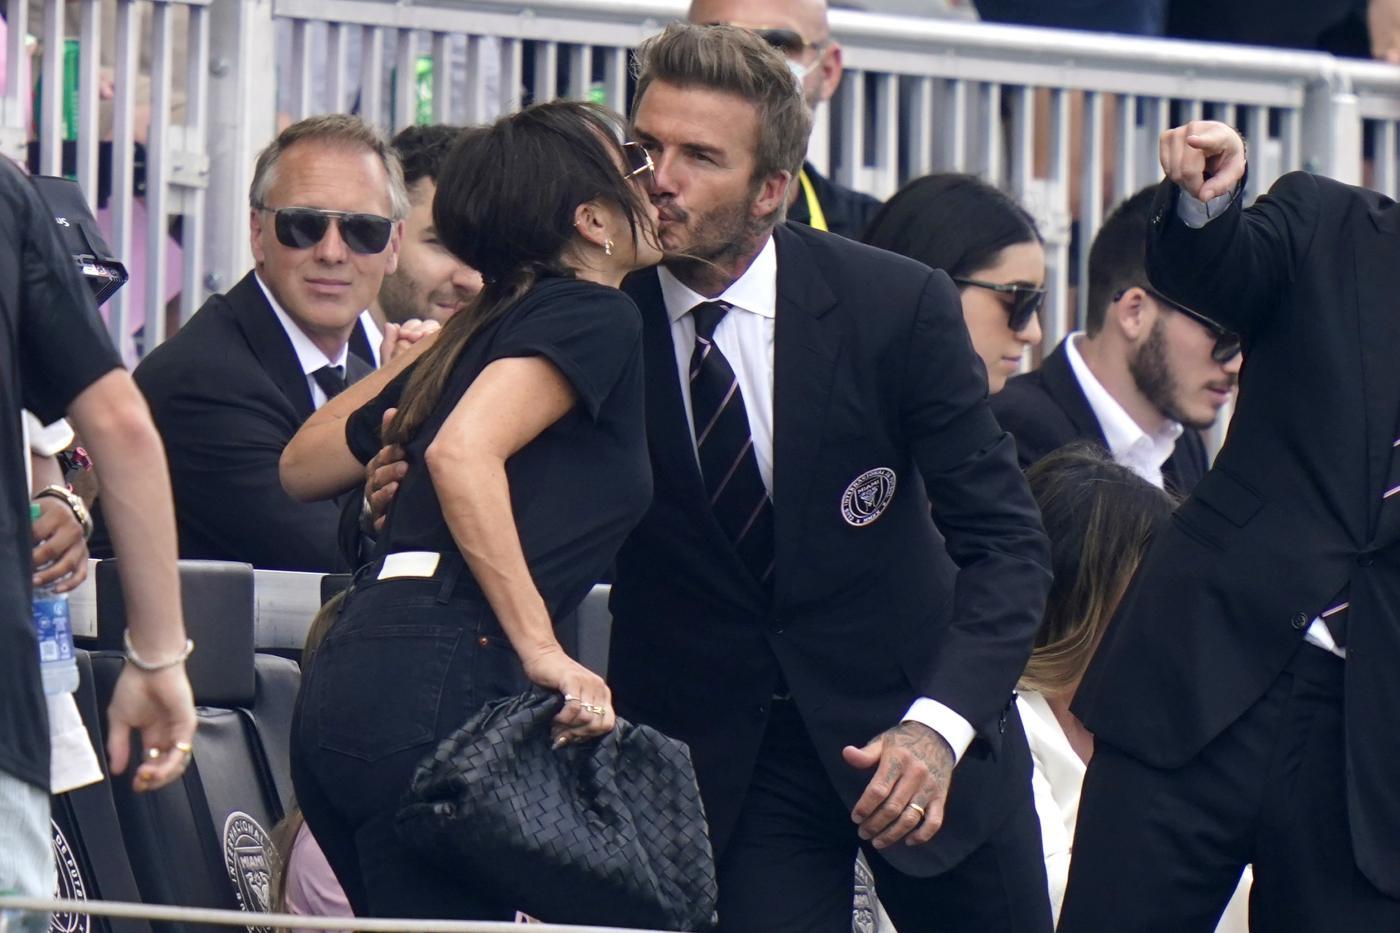 Victoria-Beckham-David-Beckham